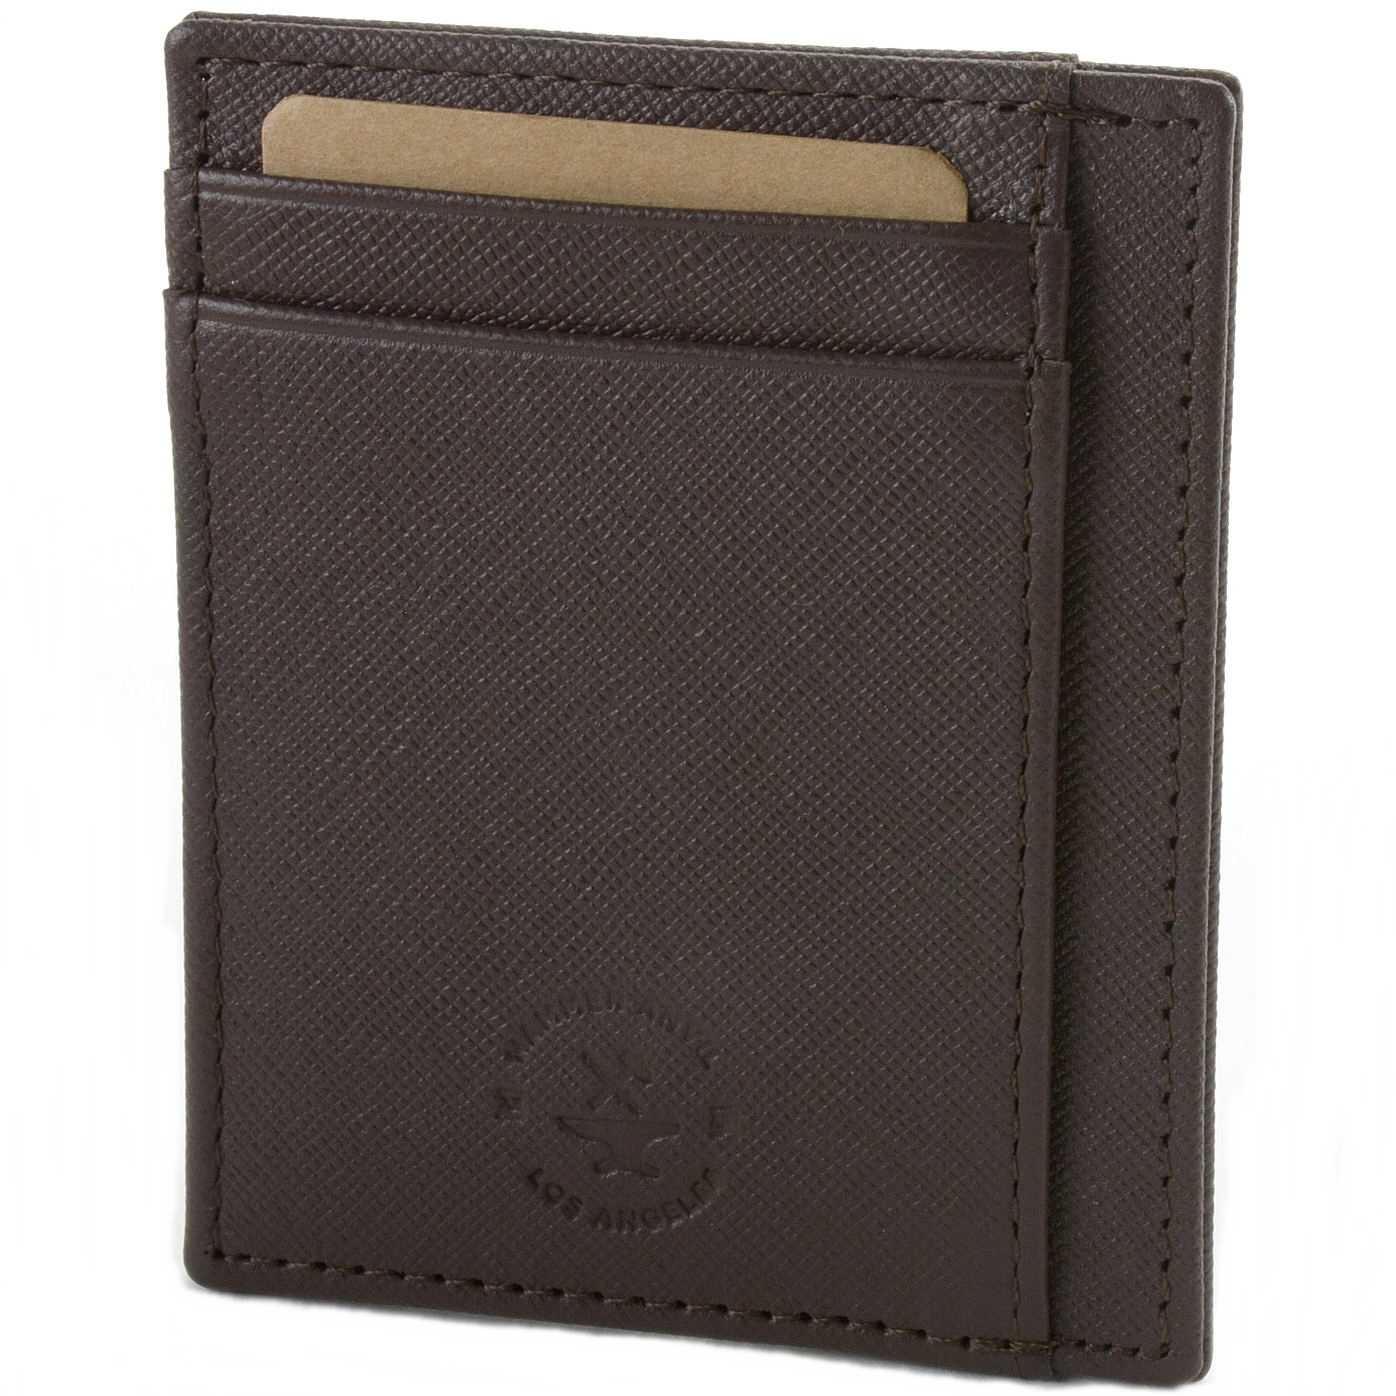 miniature 46 - Hammer-Anvil-Minimalist-Front-Pocket-Wallet-RFID-Blocking-Thin-Leather-Card-Case